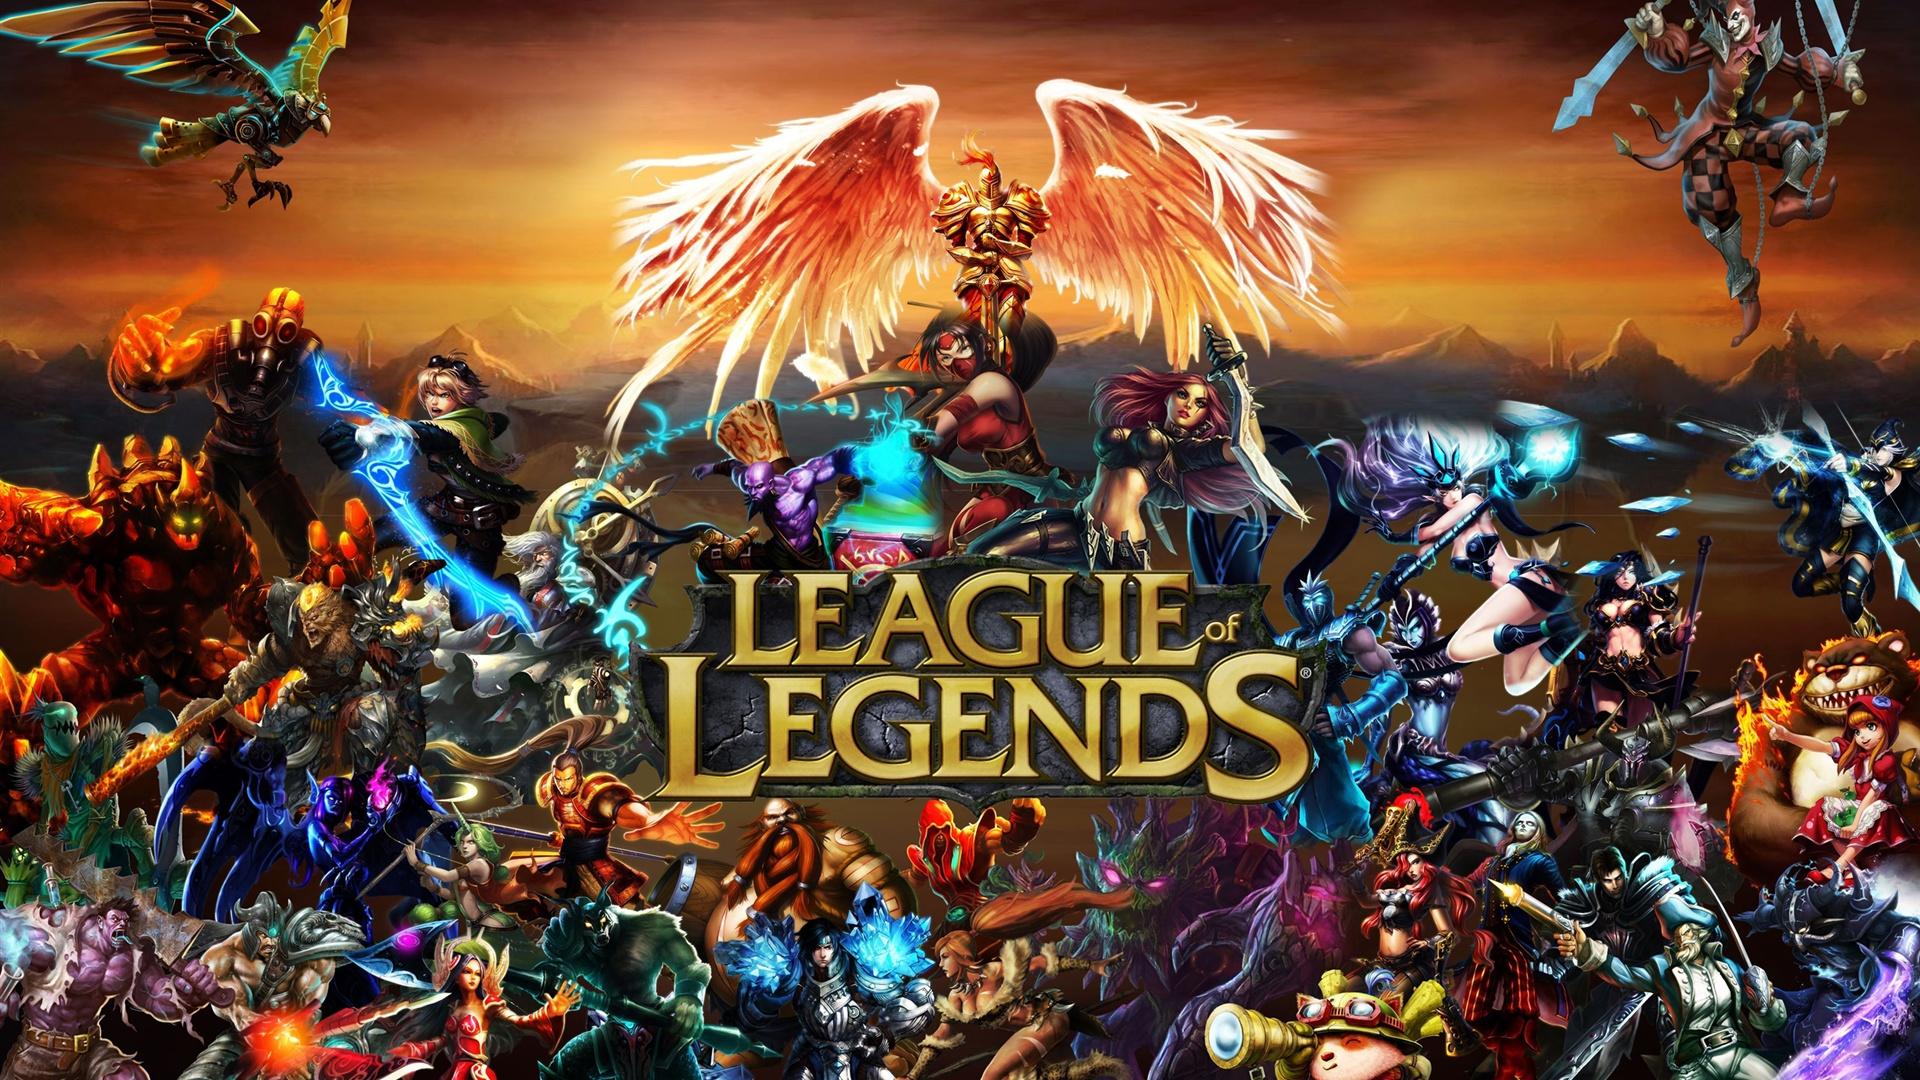 League of Legends wallpaper 61